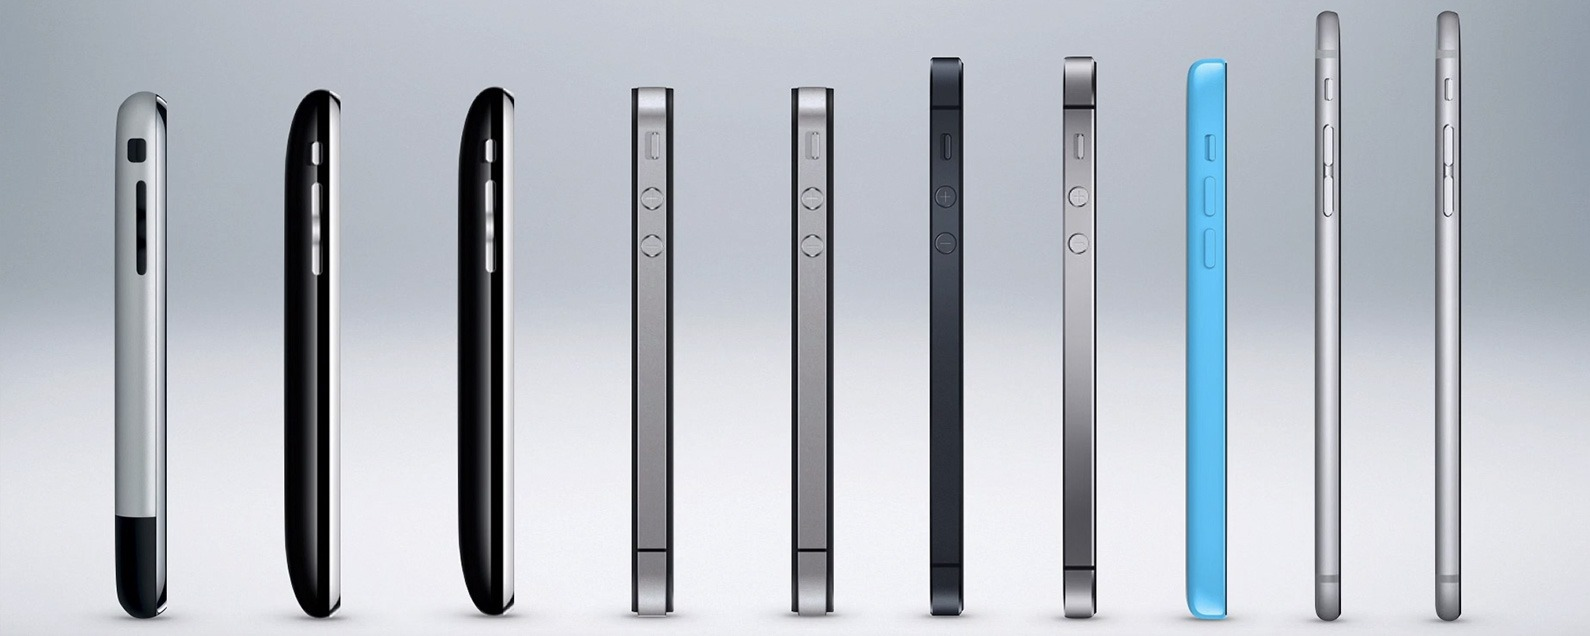 iphone generations